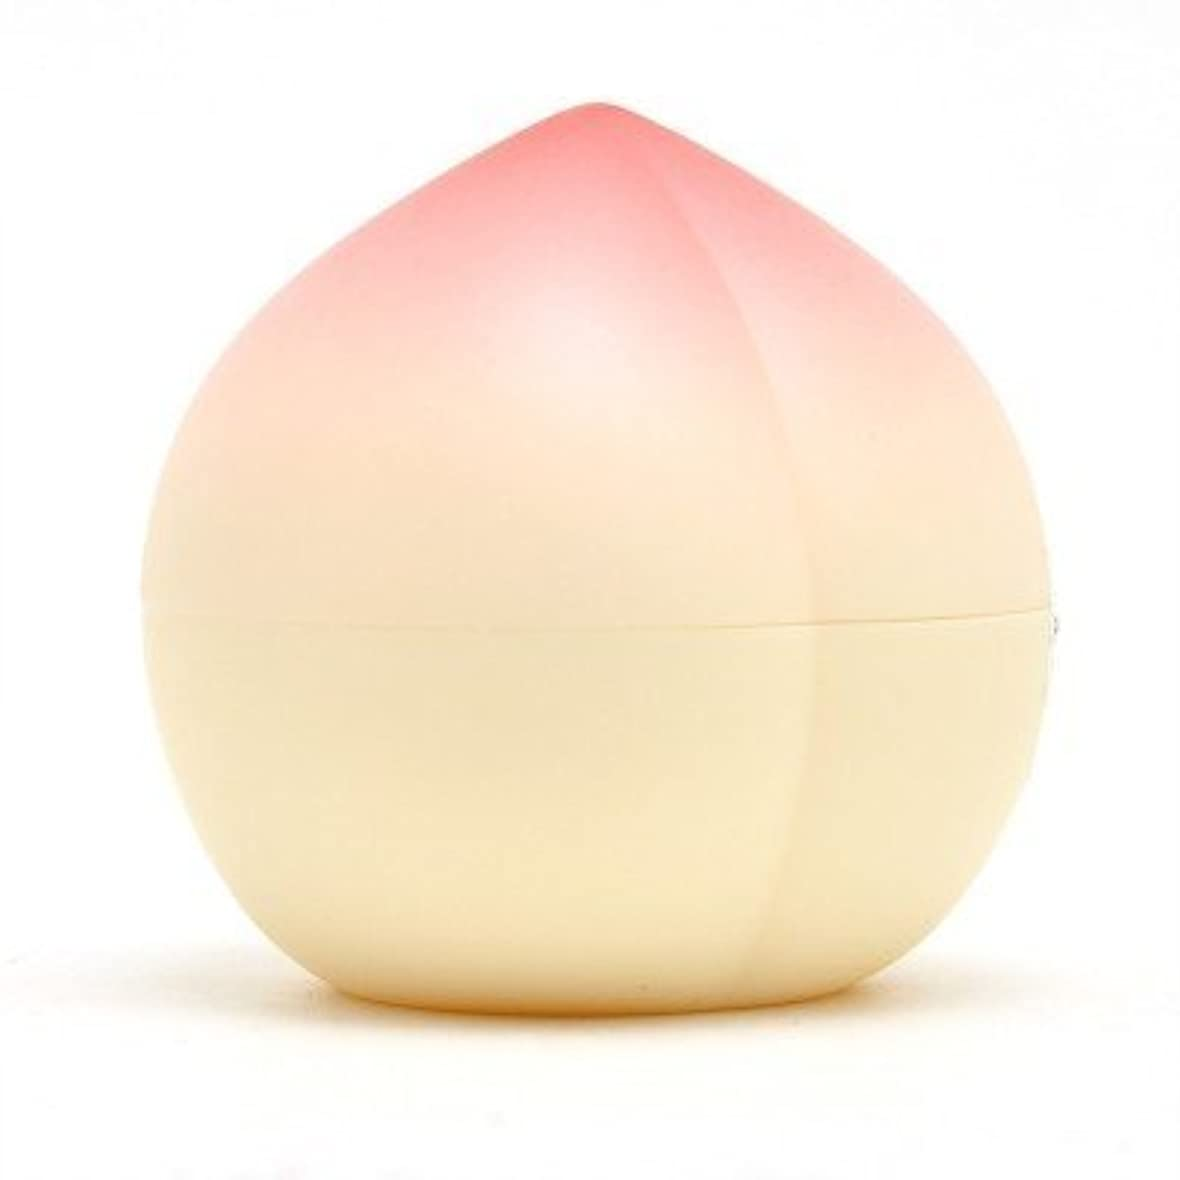 TONYMOLY トニーモリー ピーチ?ハンドクリーム 30g (Peach Antiaging Hand Cream) 海外直送品